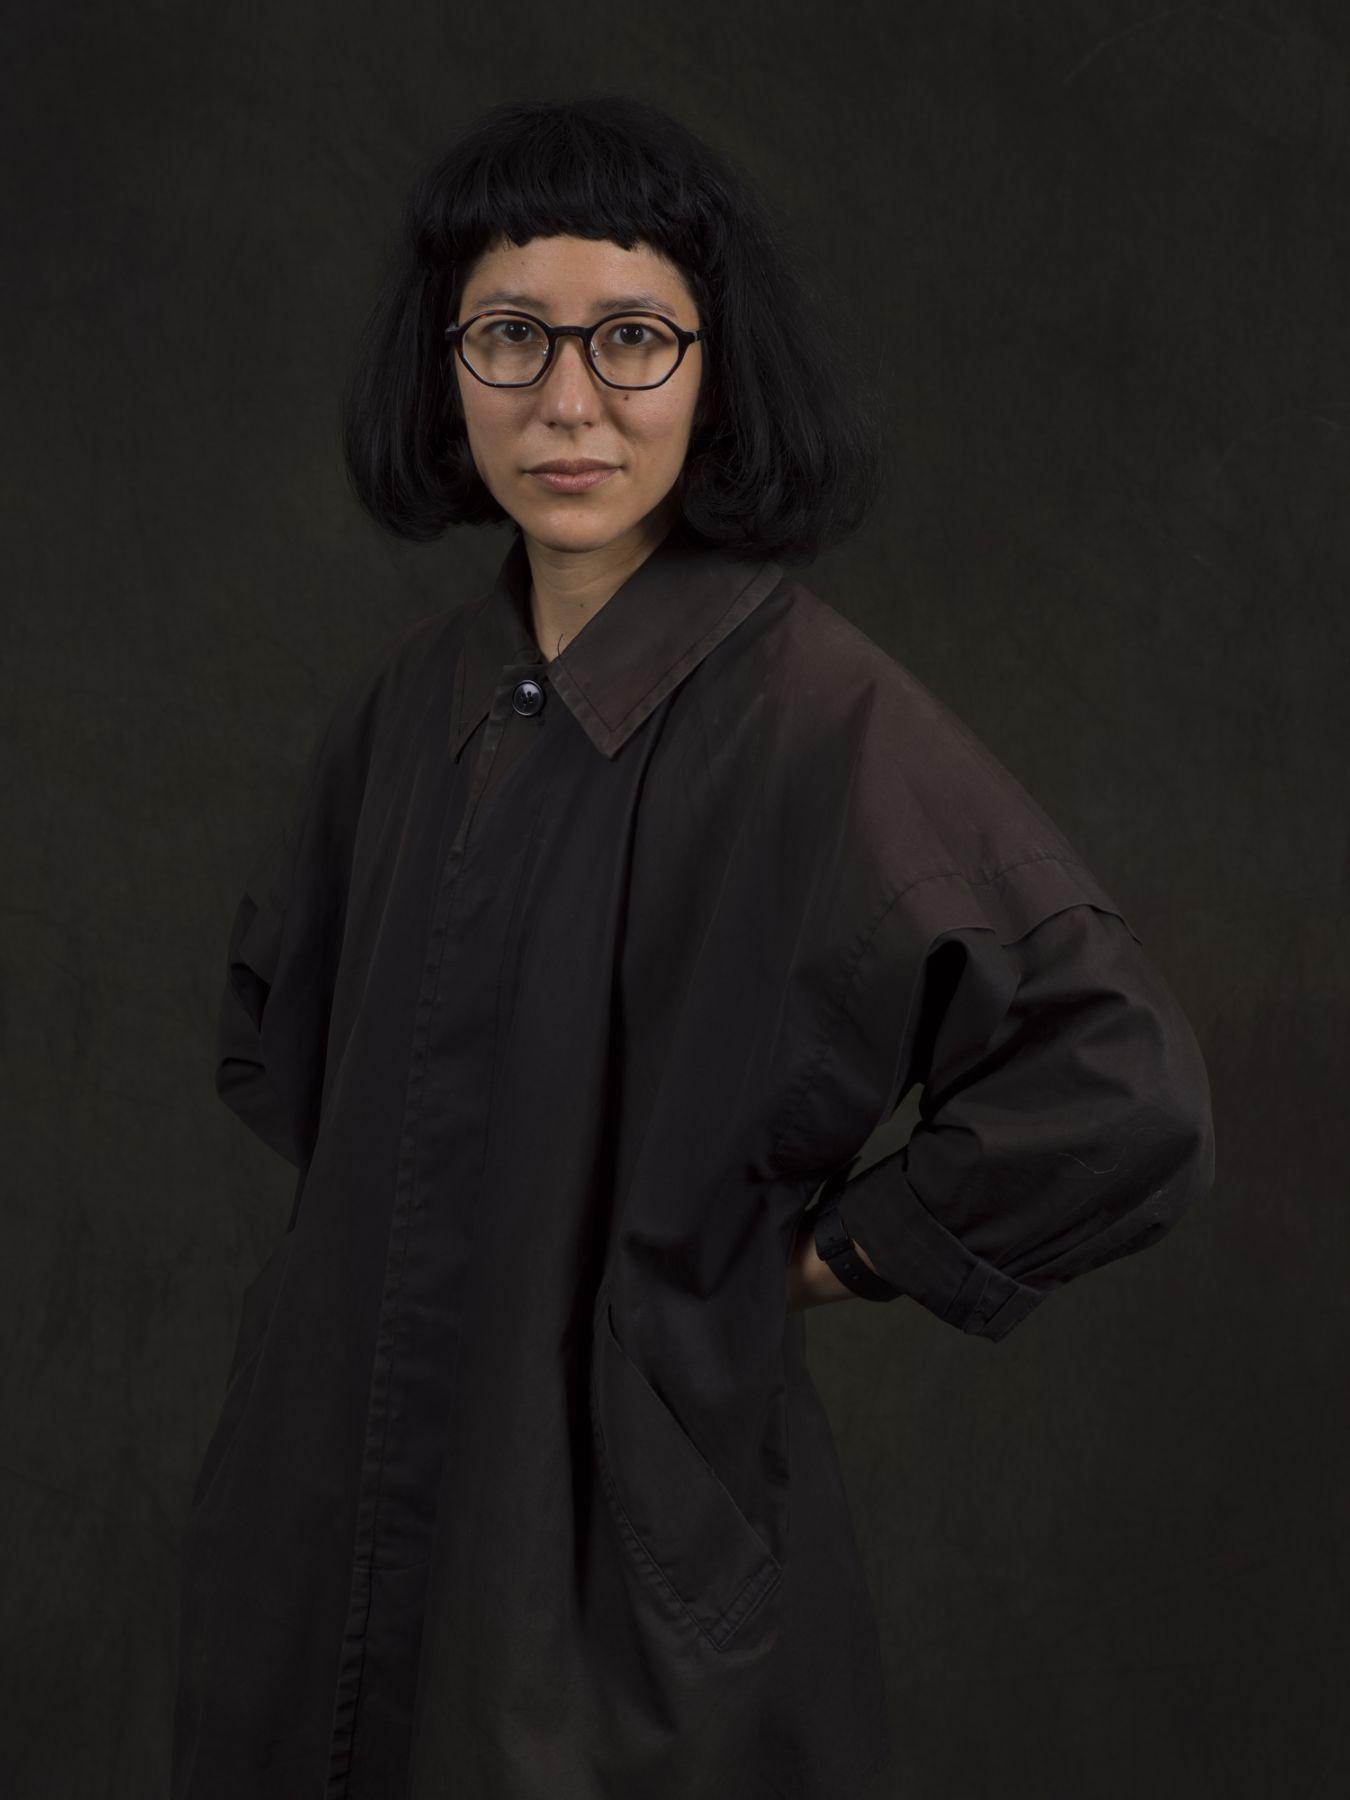 Meghan, artist